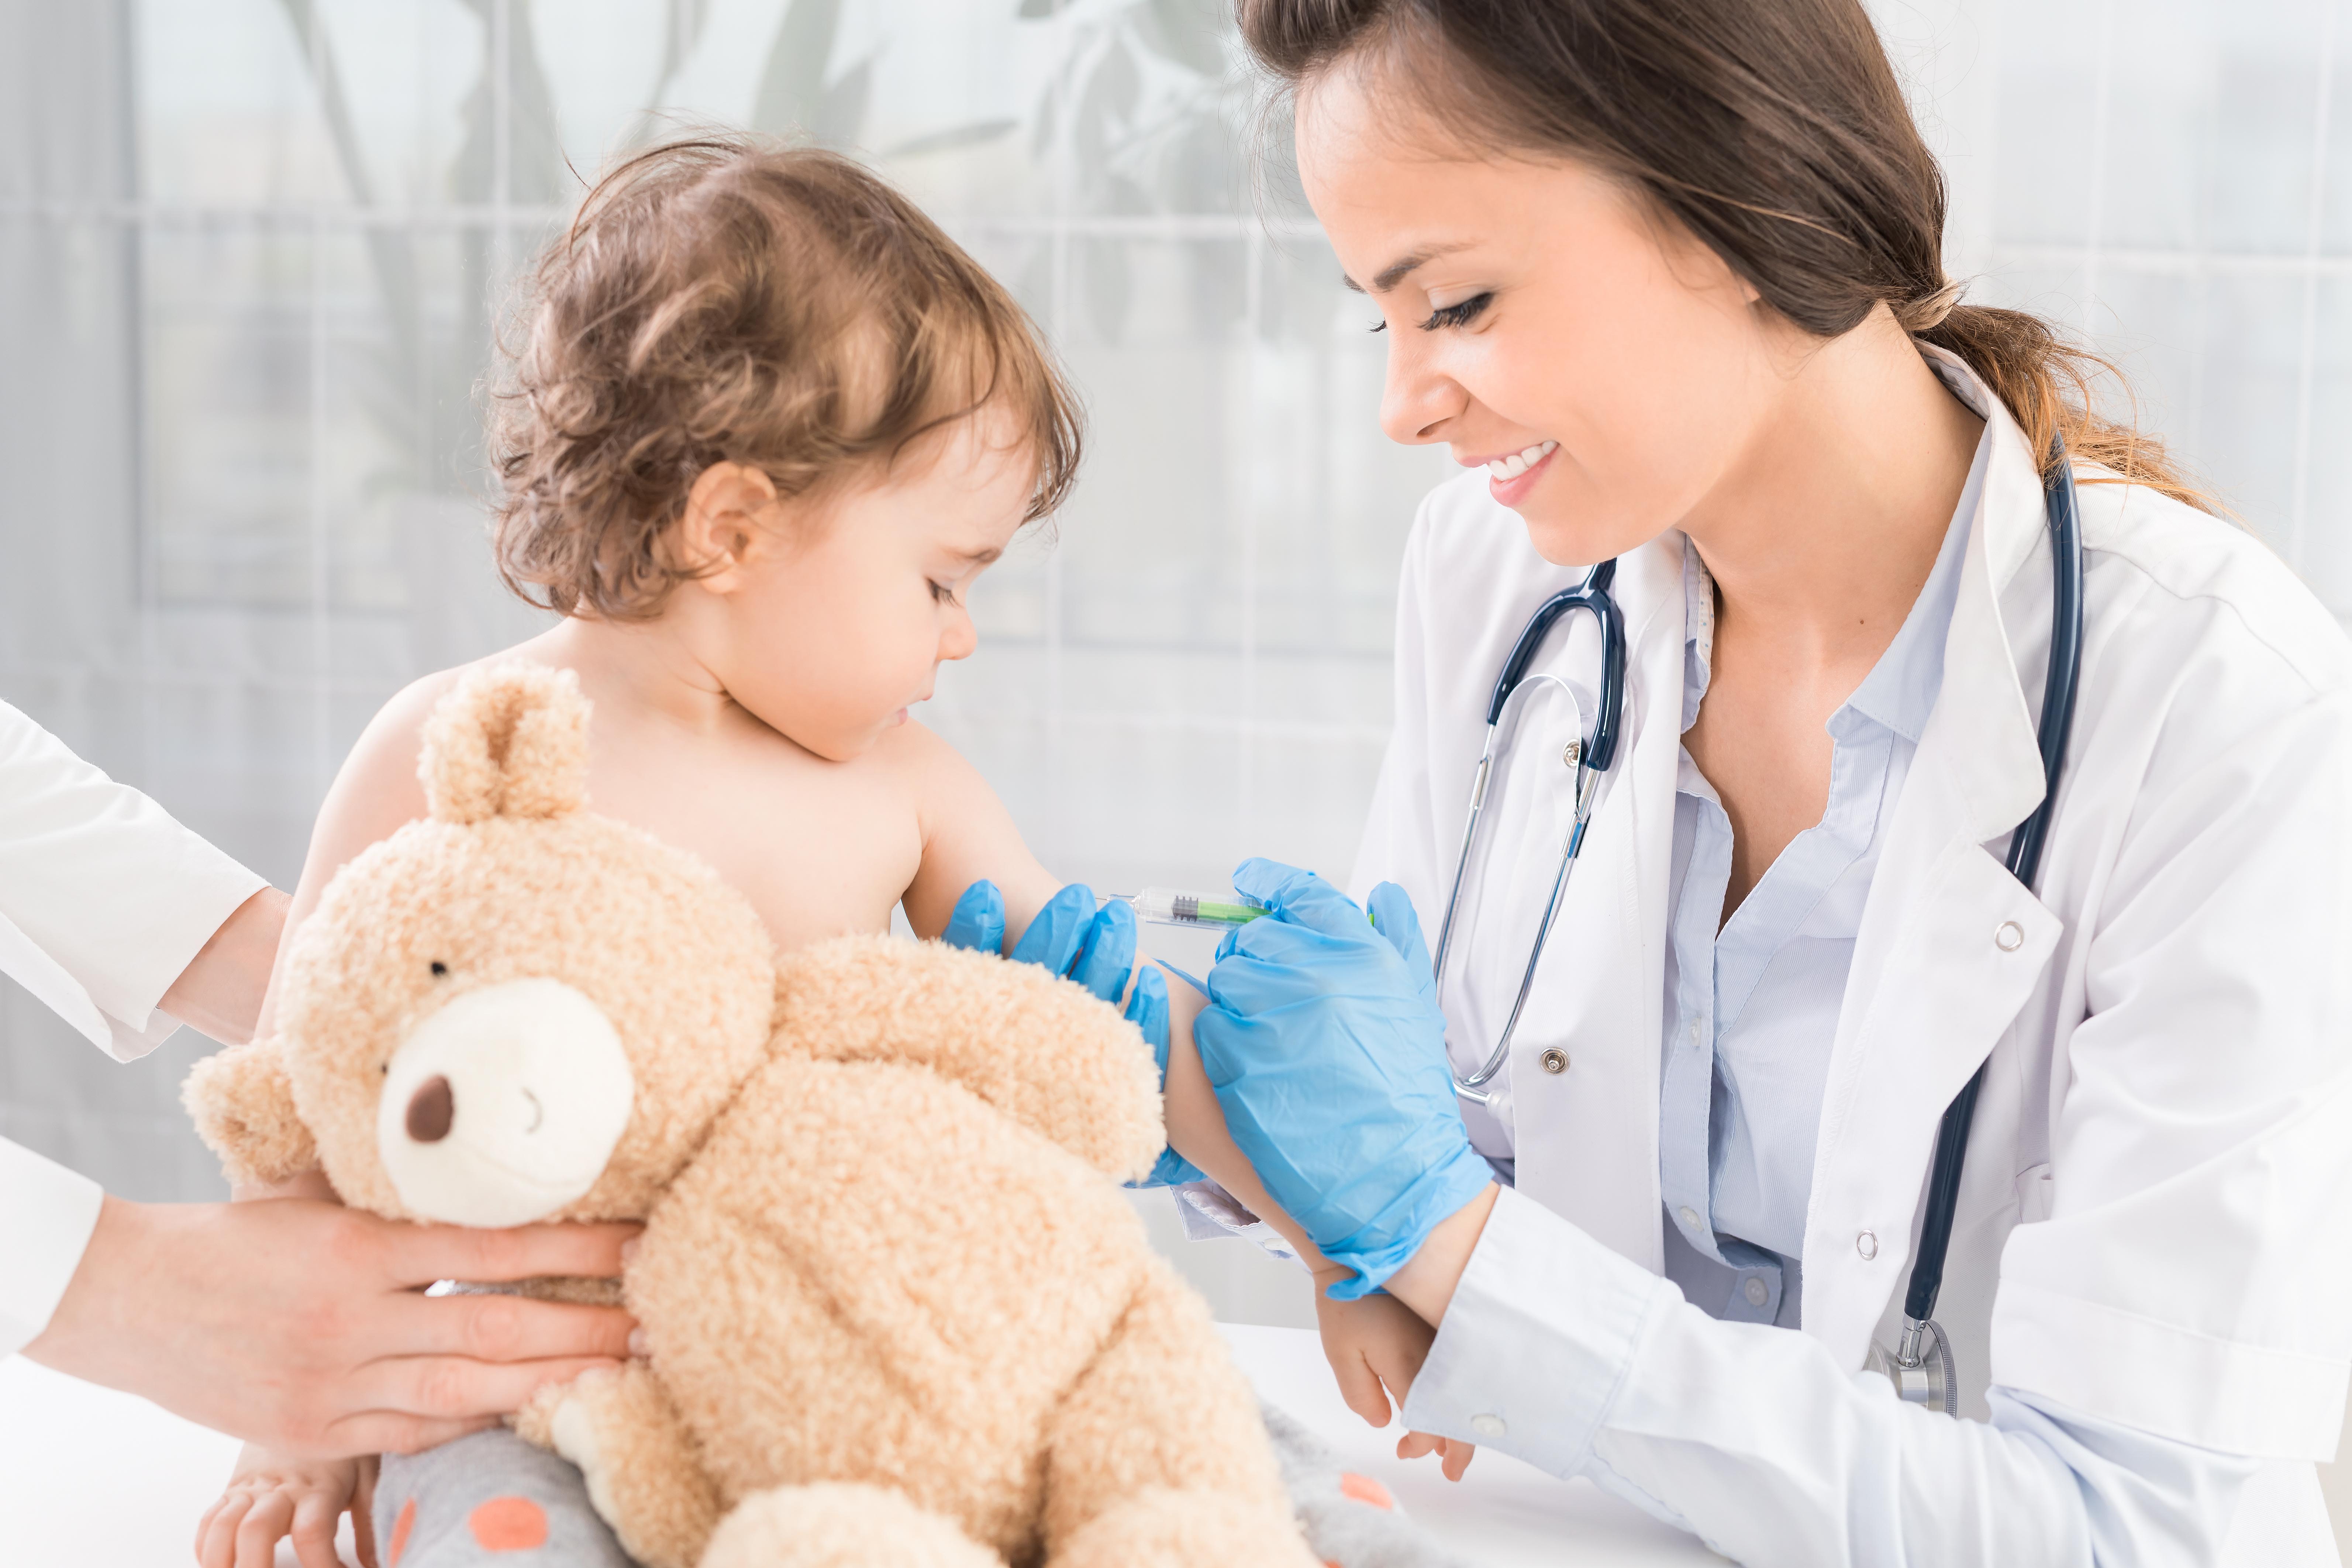 nurse vaccinating infant